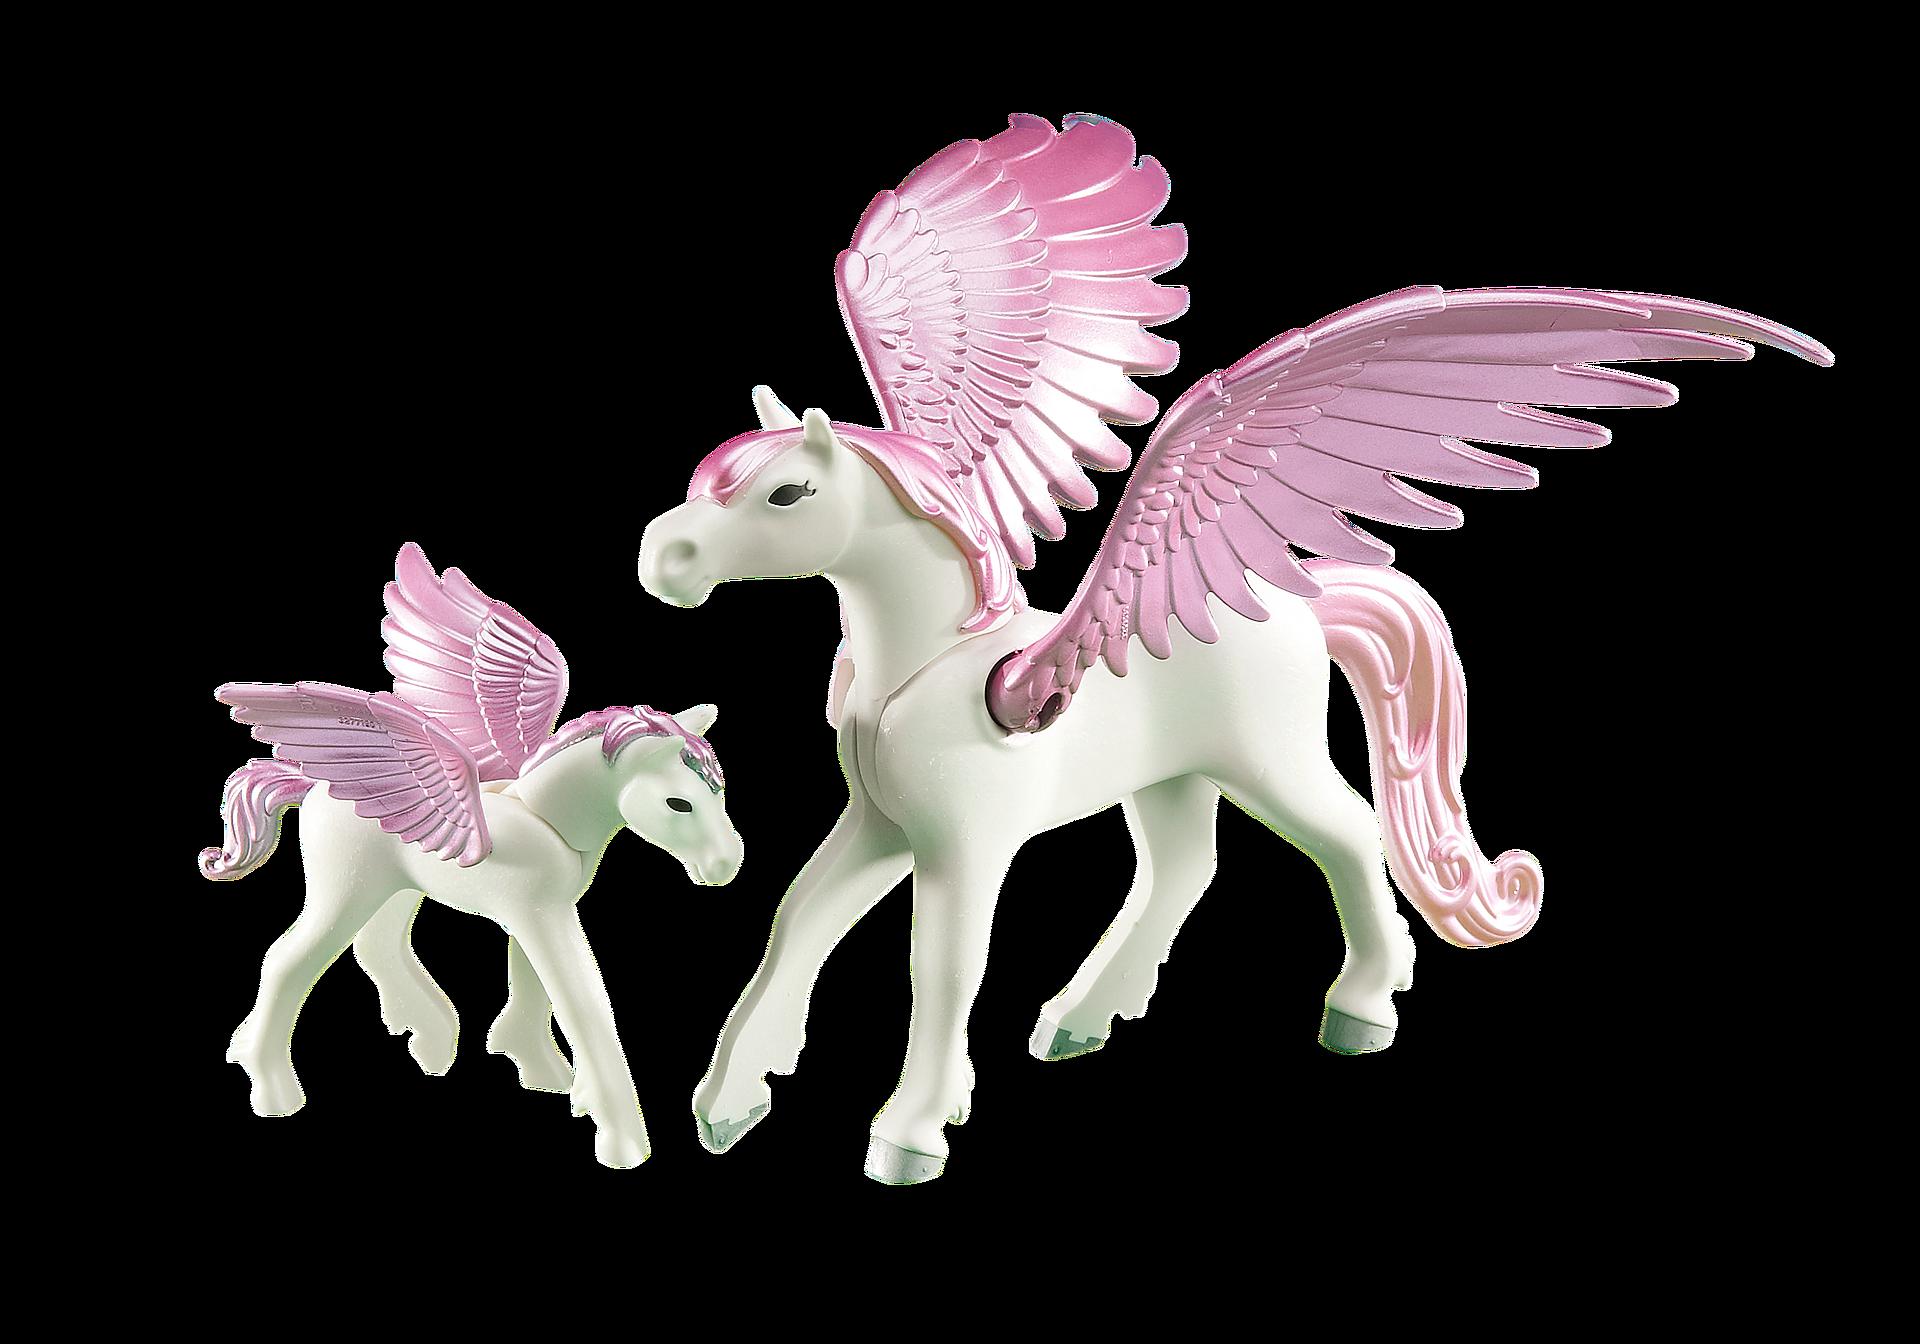 6461 Pegasus mit Fohlen zoom image1